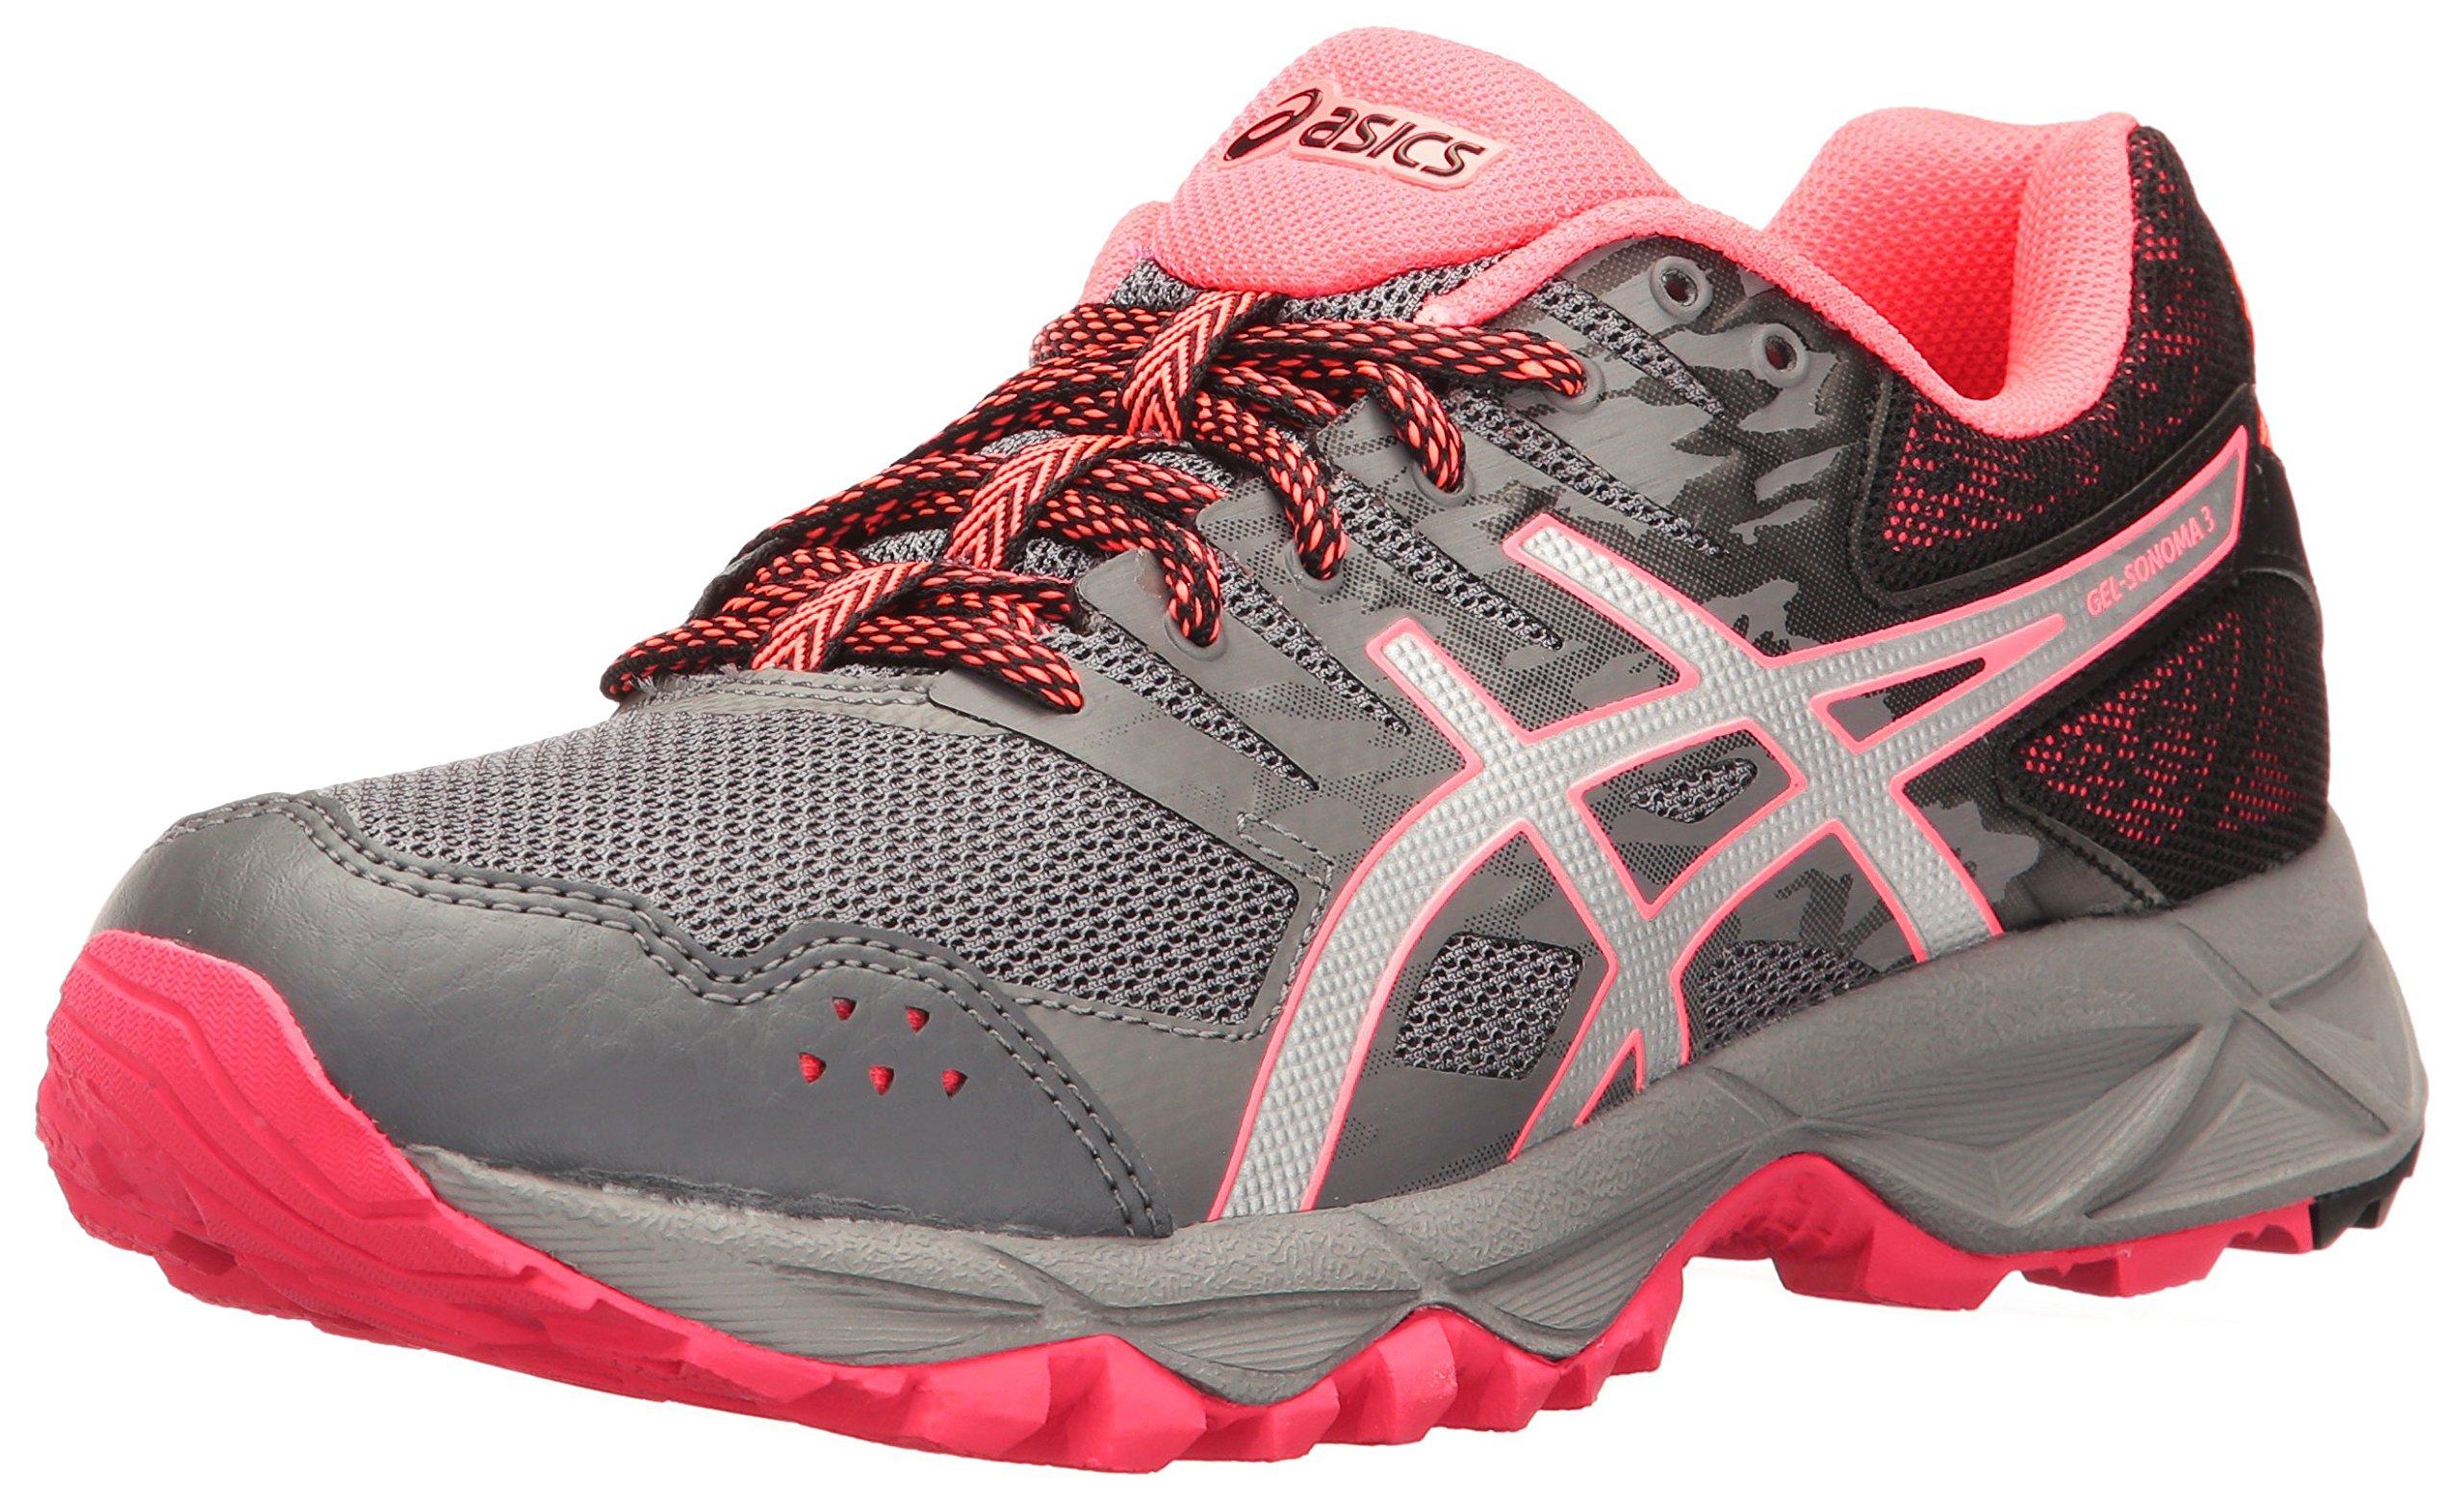 ASICS Women's Gel-Sonoma 3 Trail Runner, Carbon/Silver/Diva Pink, 11.5 M US